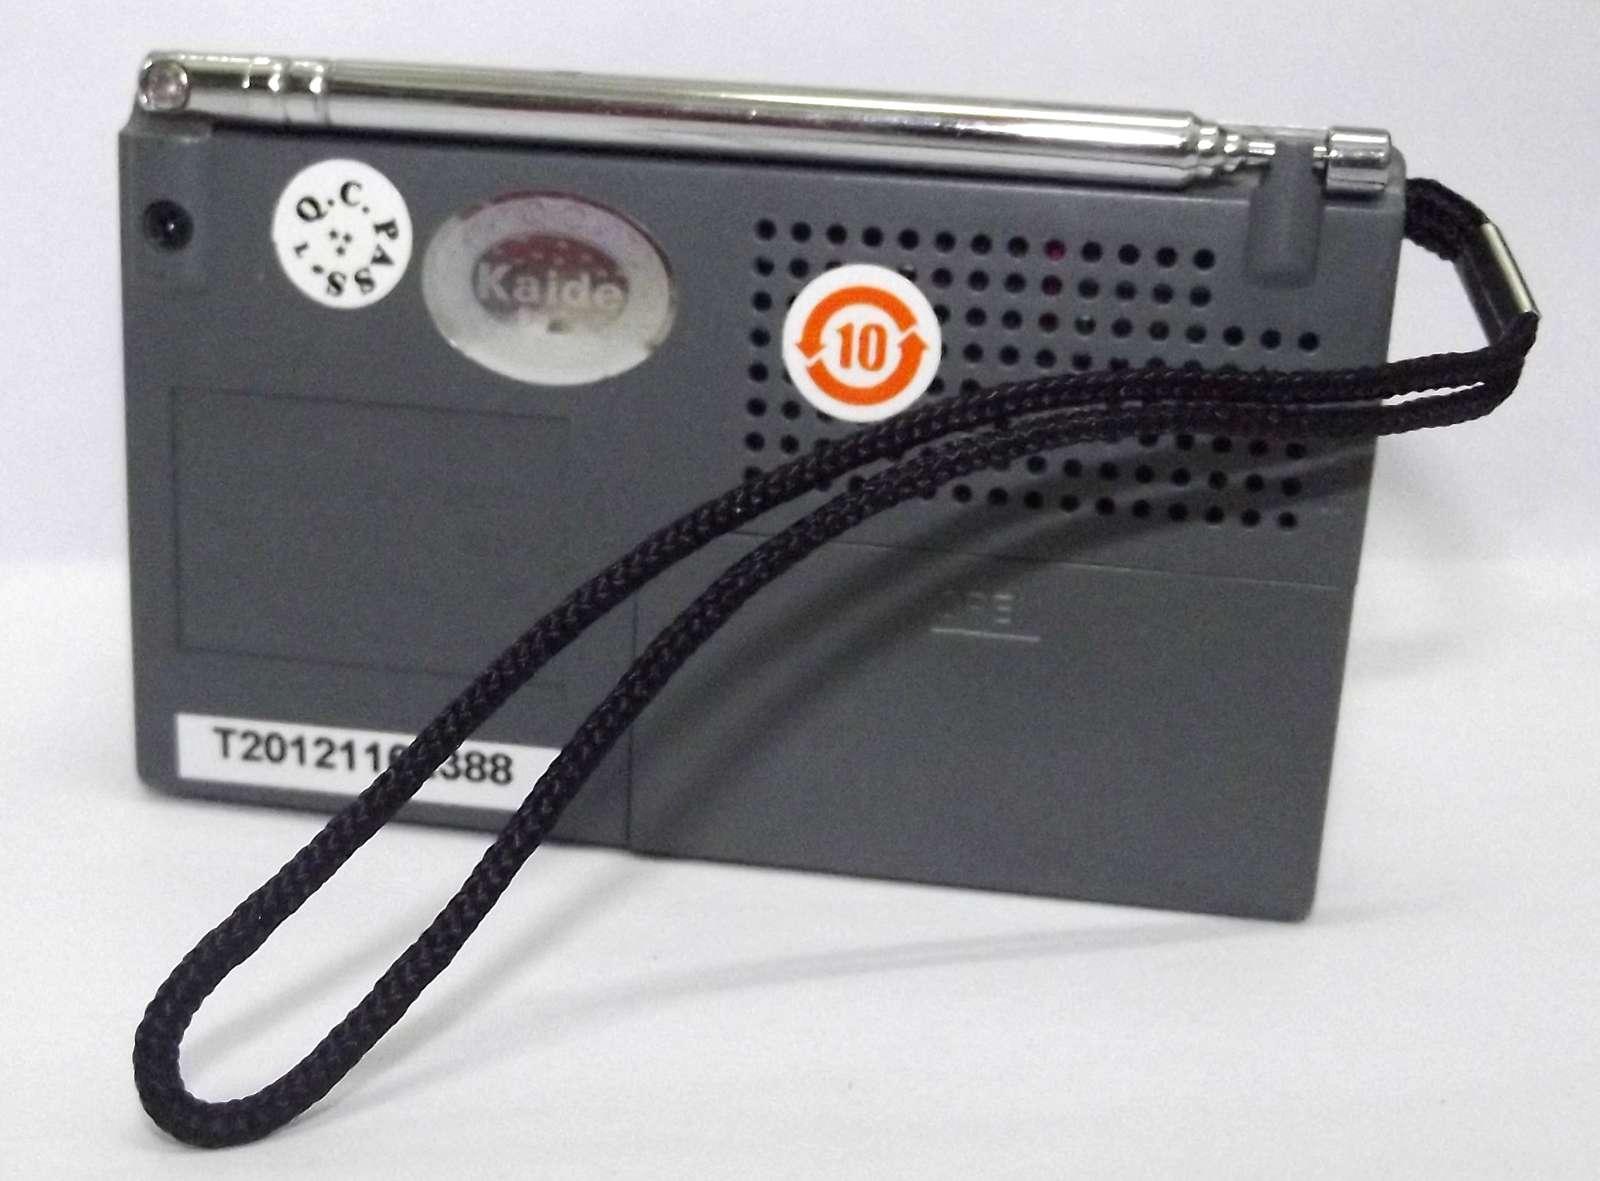 poste radio de poche portable 2 bande fm am 91 x 56 x 21mm pile fournies ebay. Black Bedroom Furniture Sets. Home Design Ideas